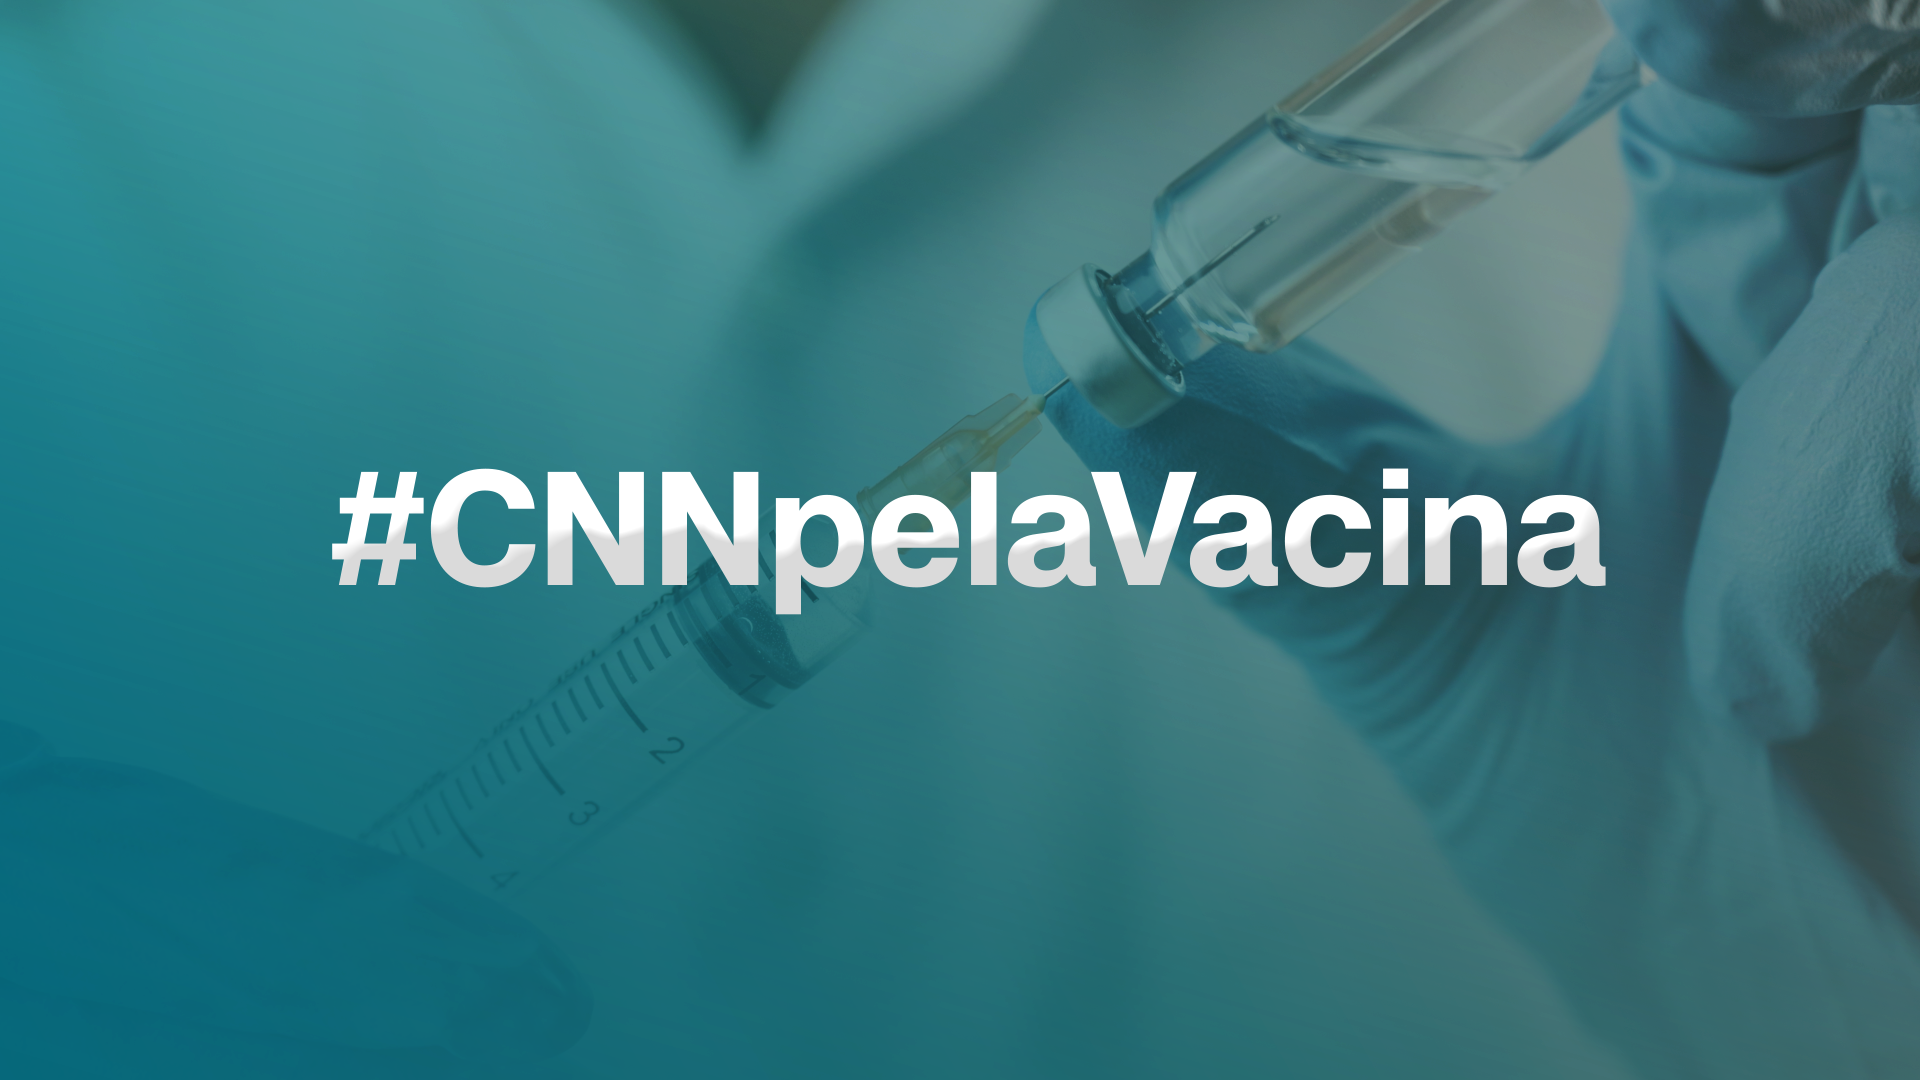 CNN pela Vacina